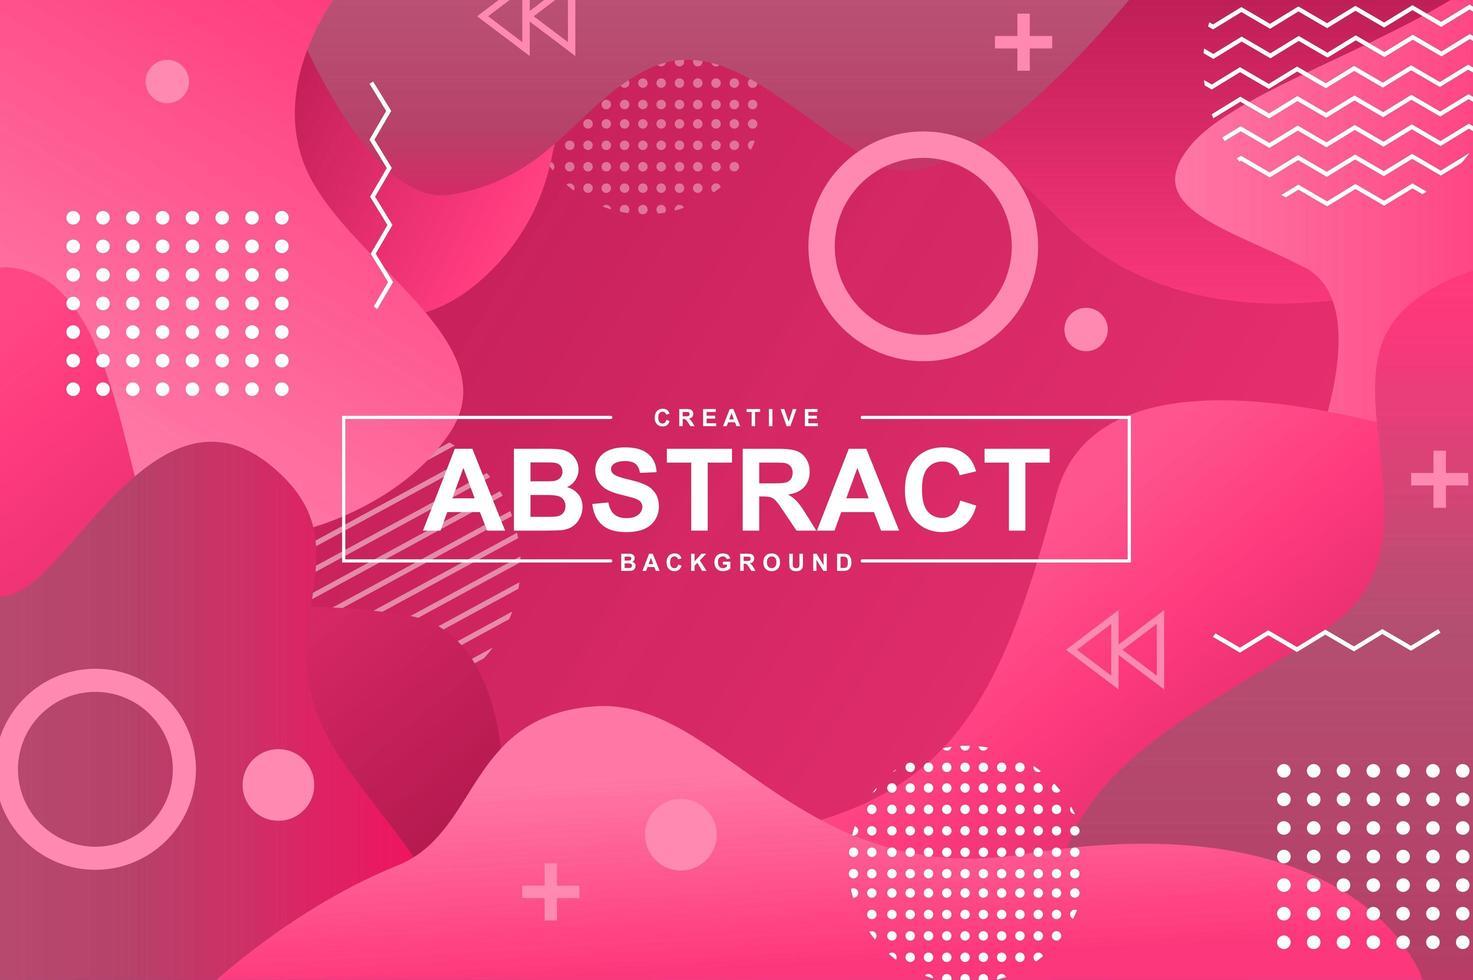 abstrakt design med rosa flytande lutningsformer vektor